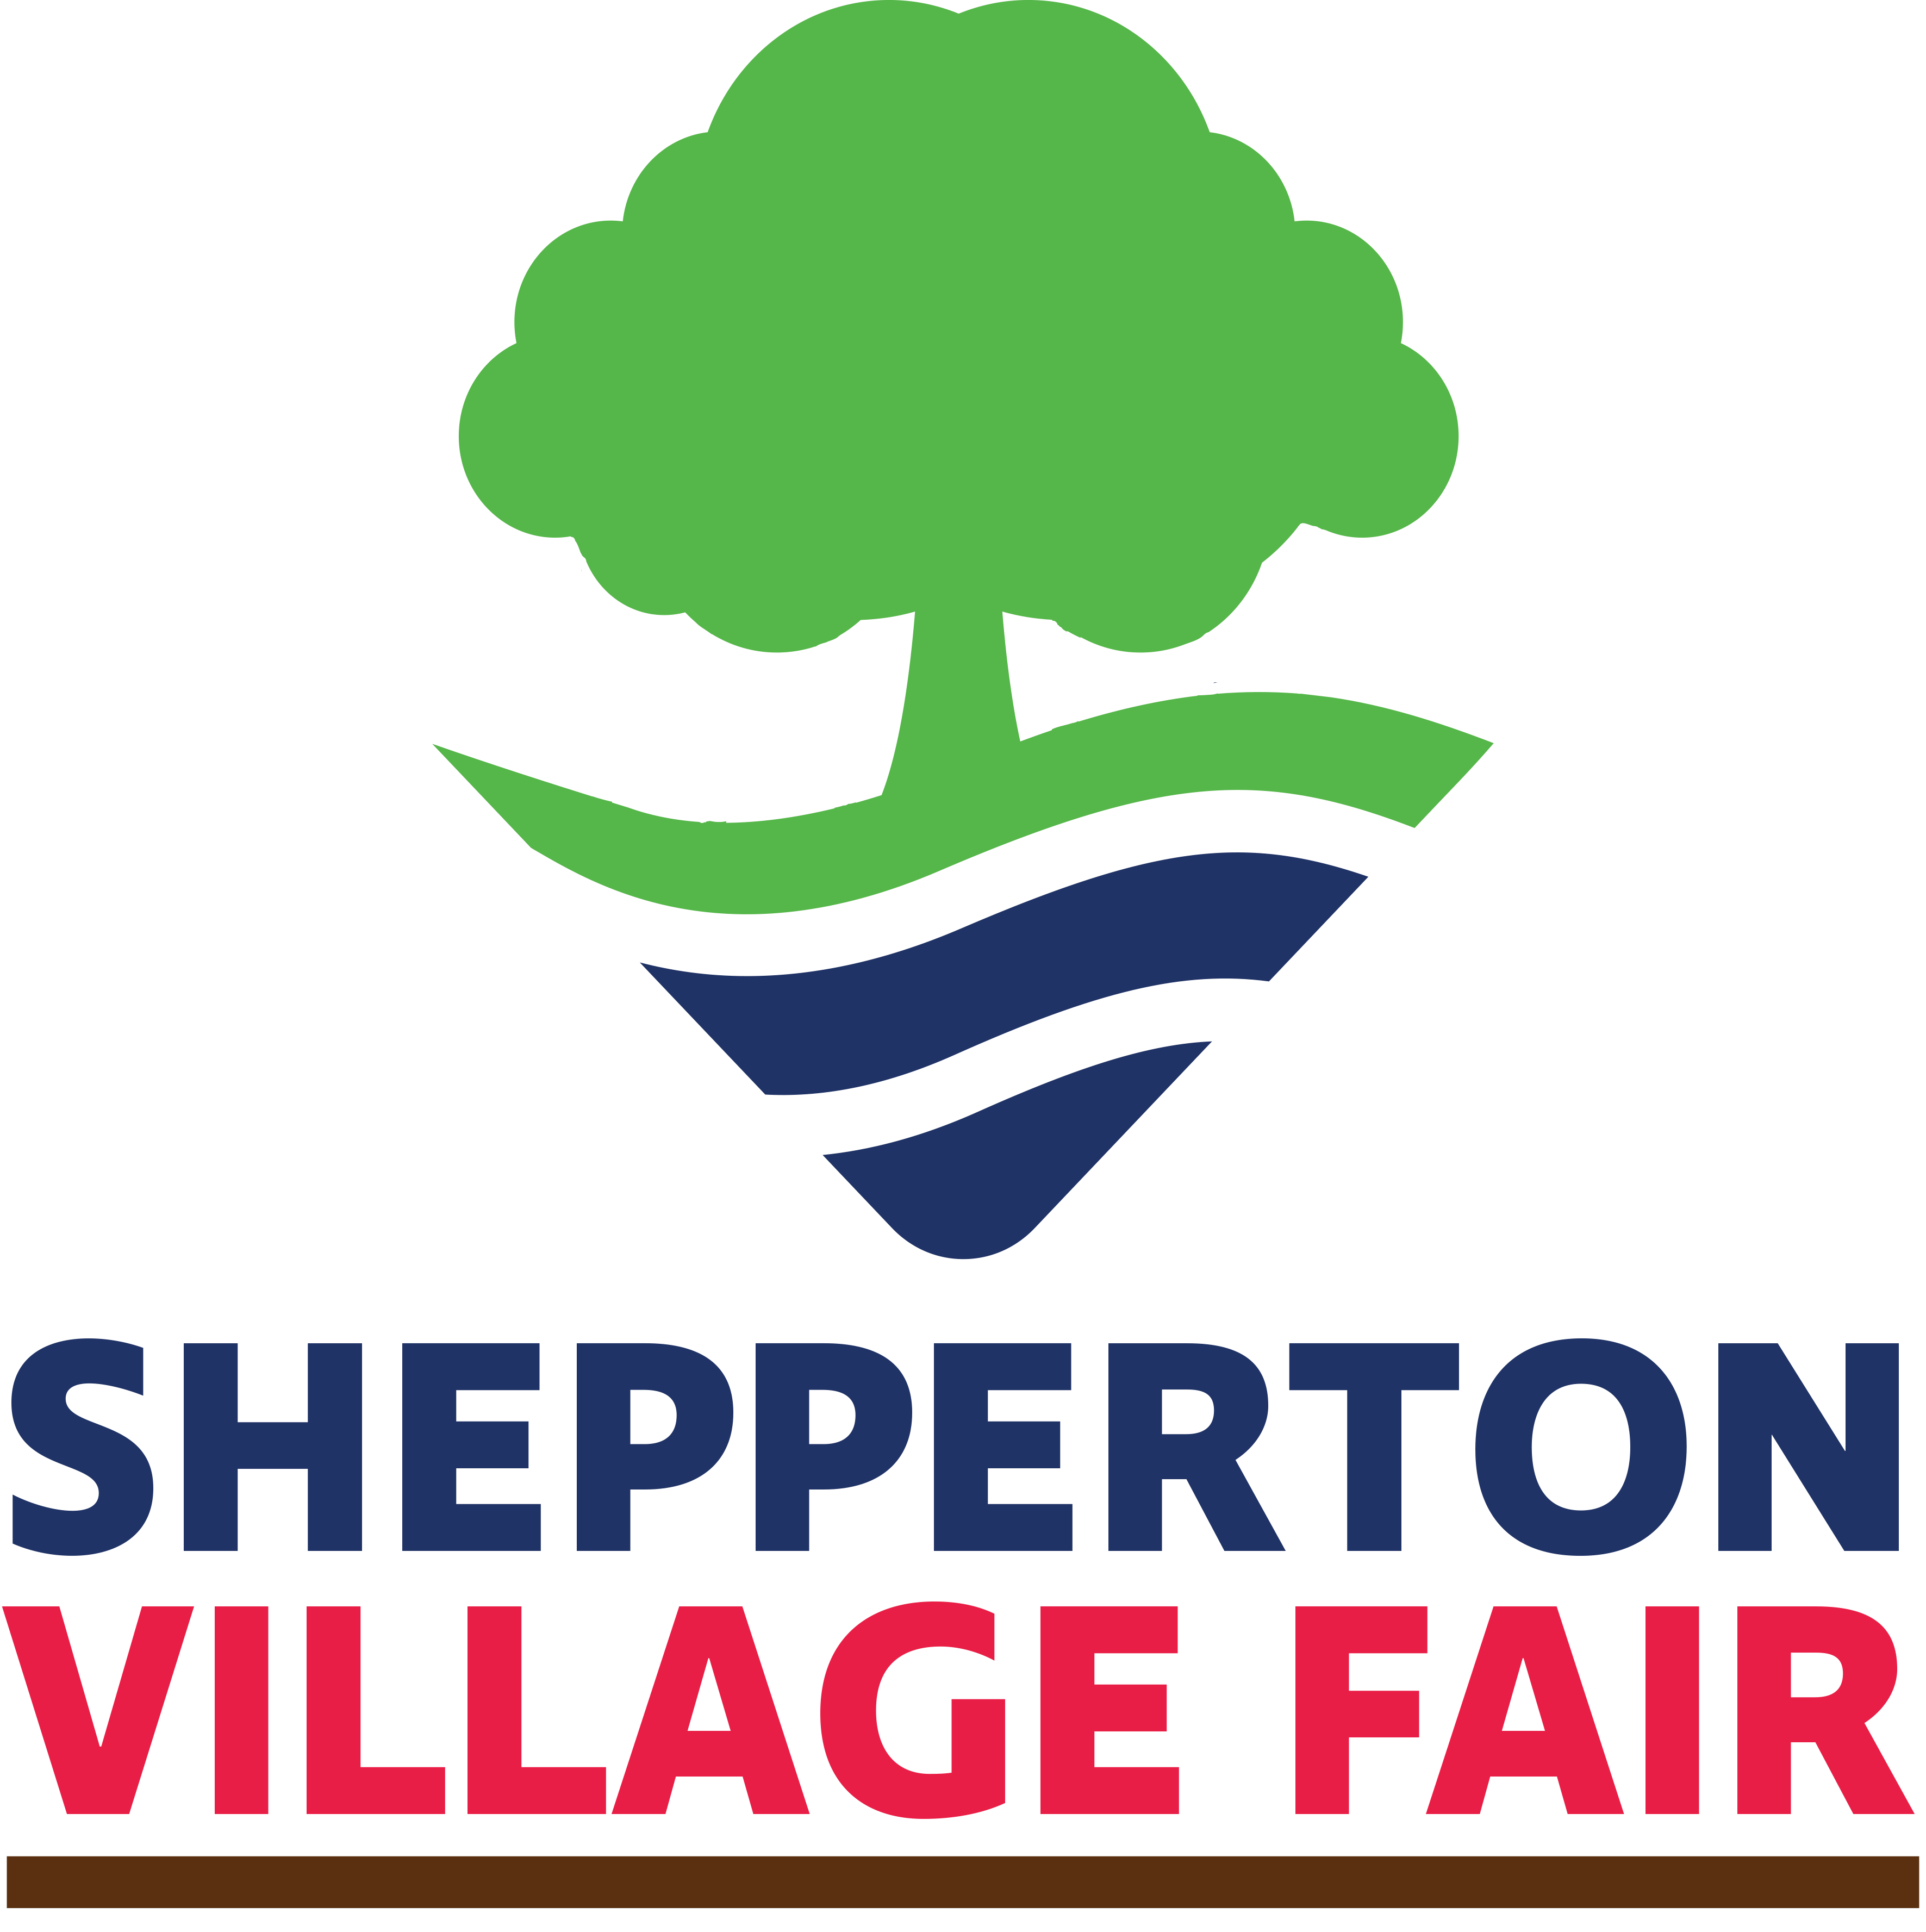 Shepperton Village Fair